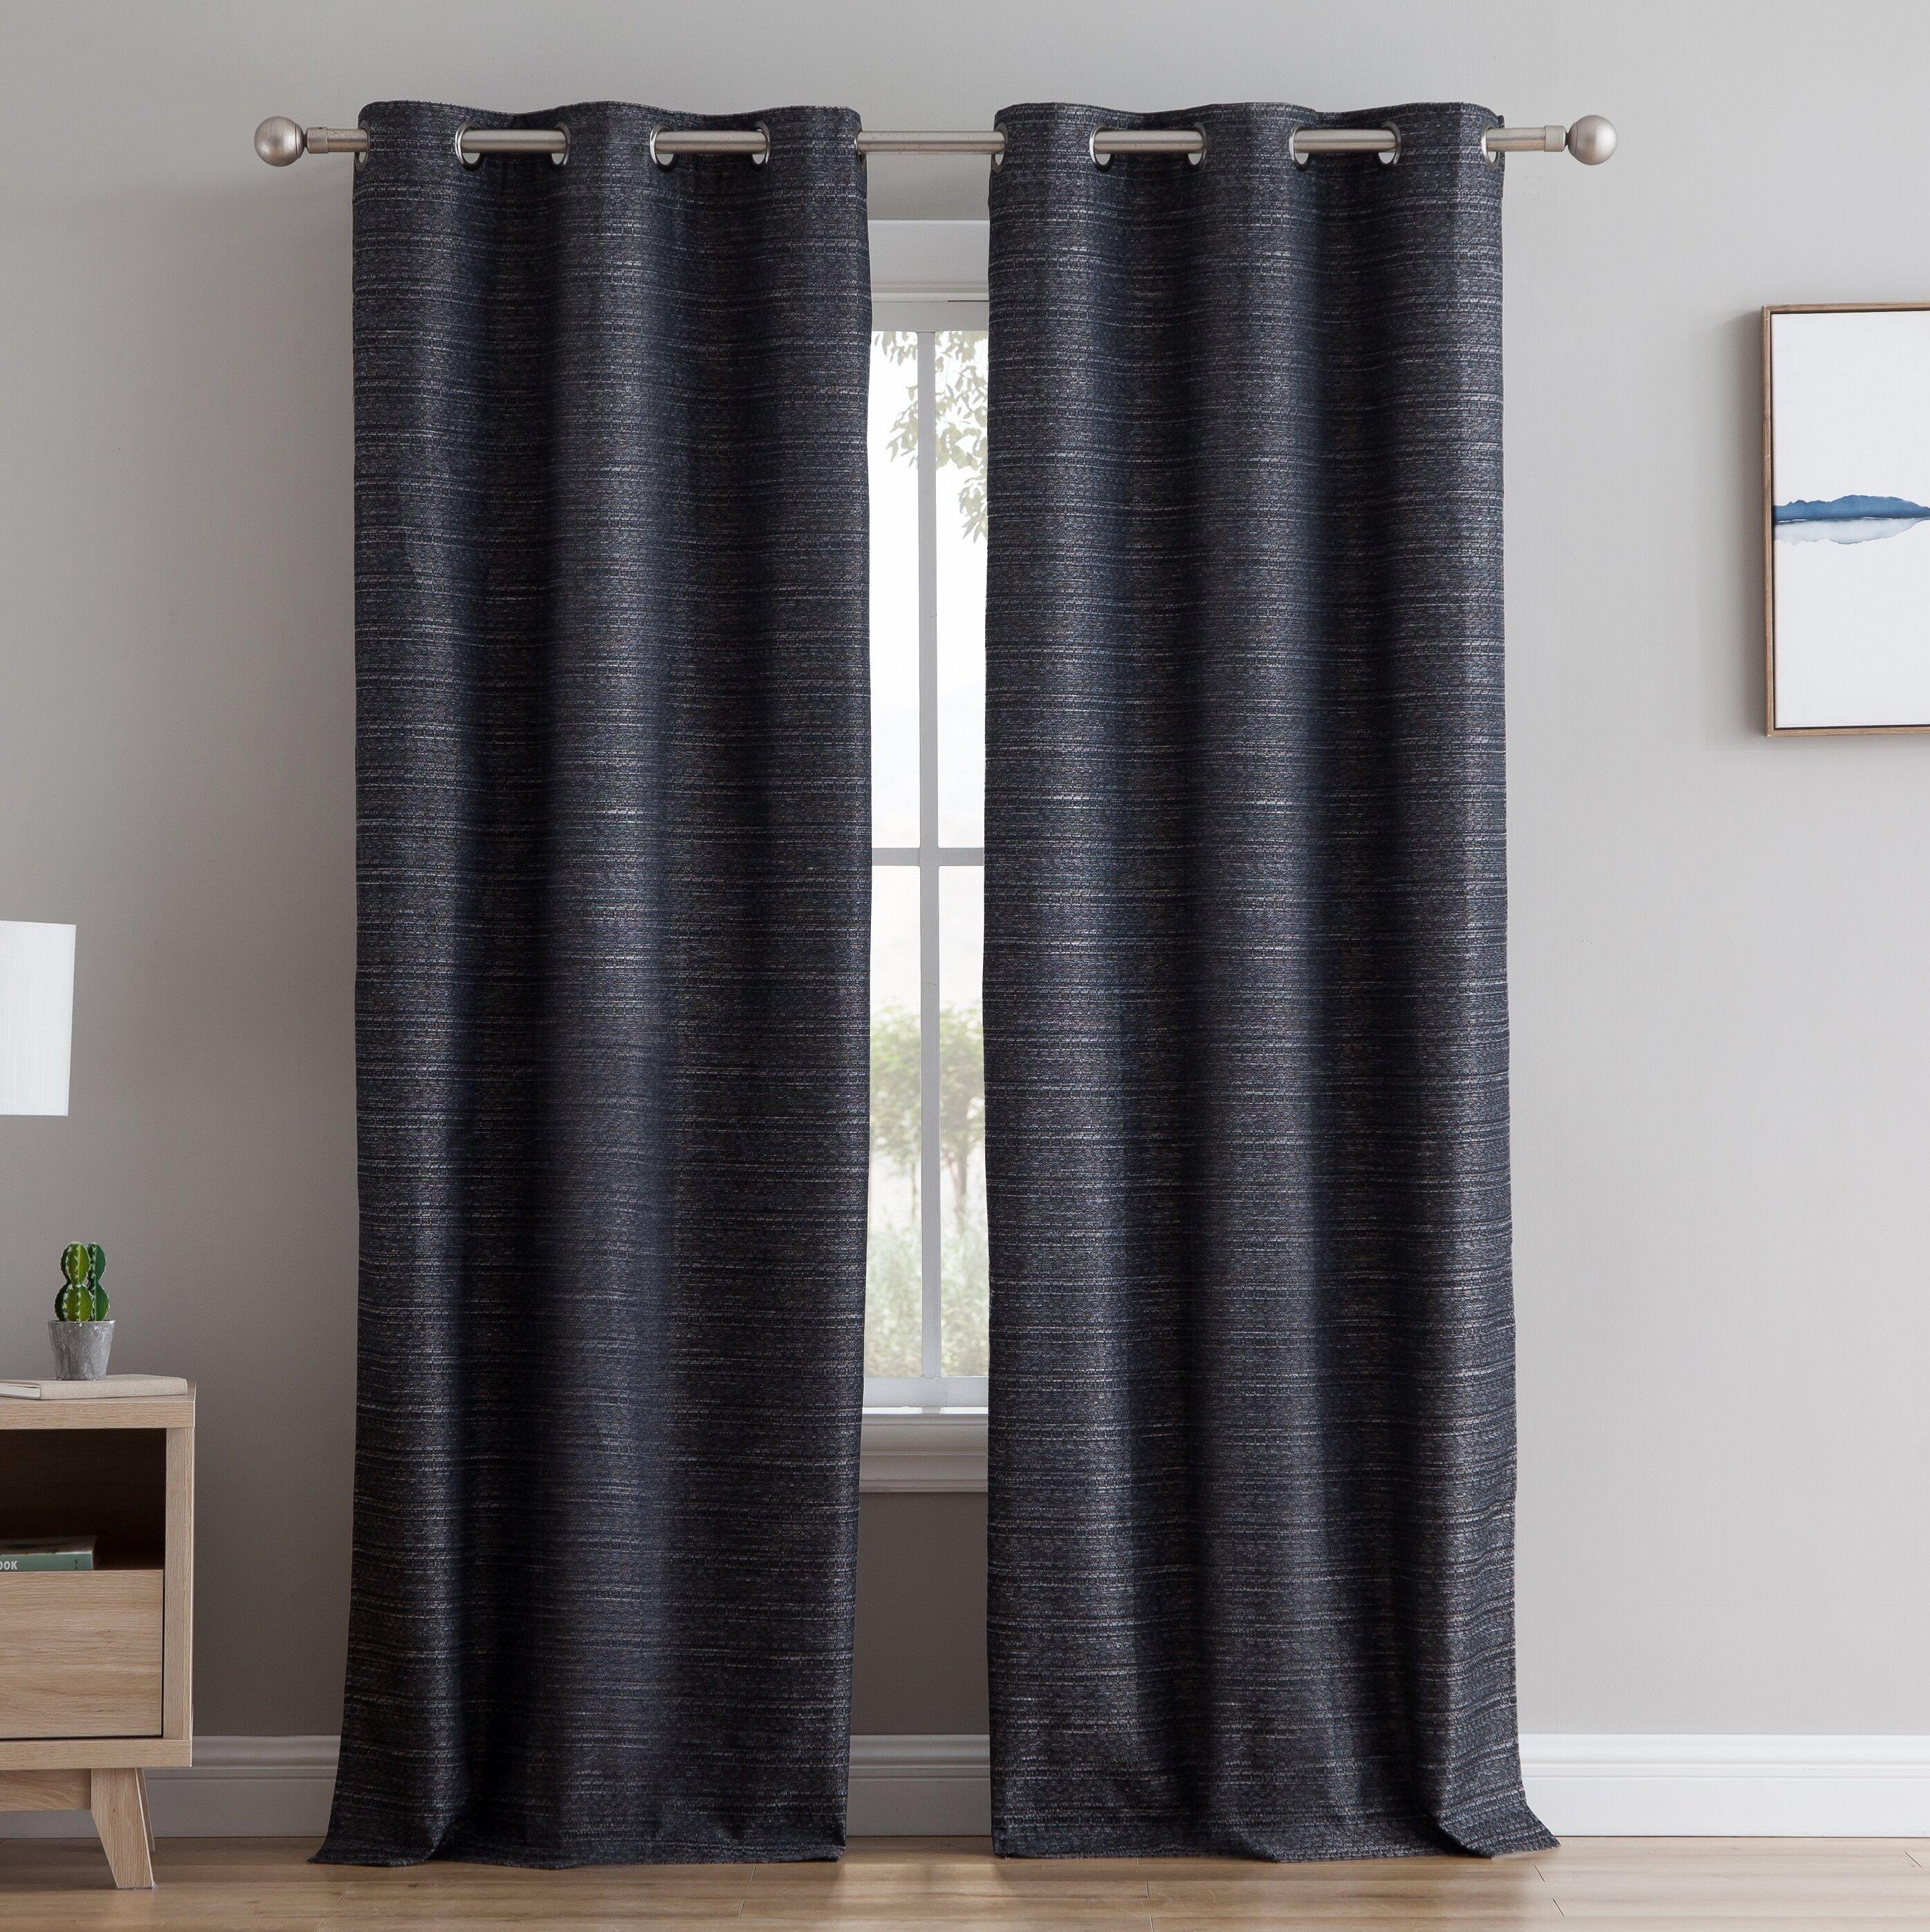 Scalloped Bottom Premium Quality New Swirl Circle White Lace Cheap Net Curtain